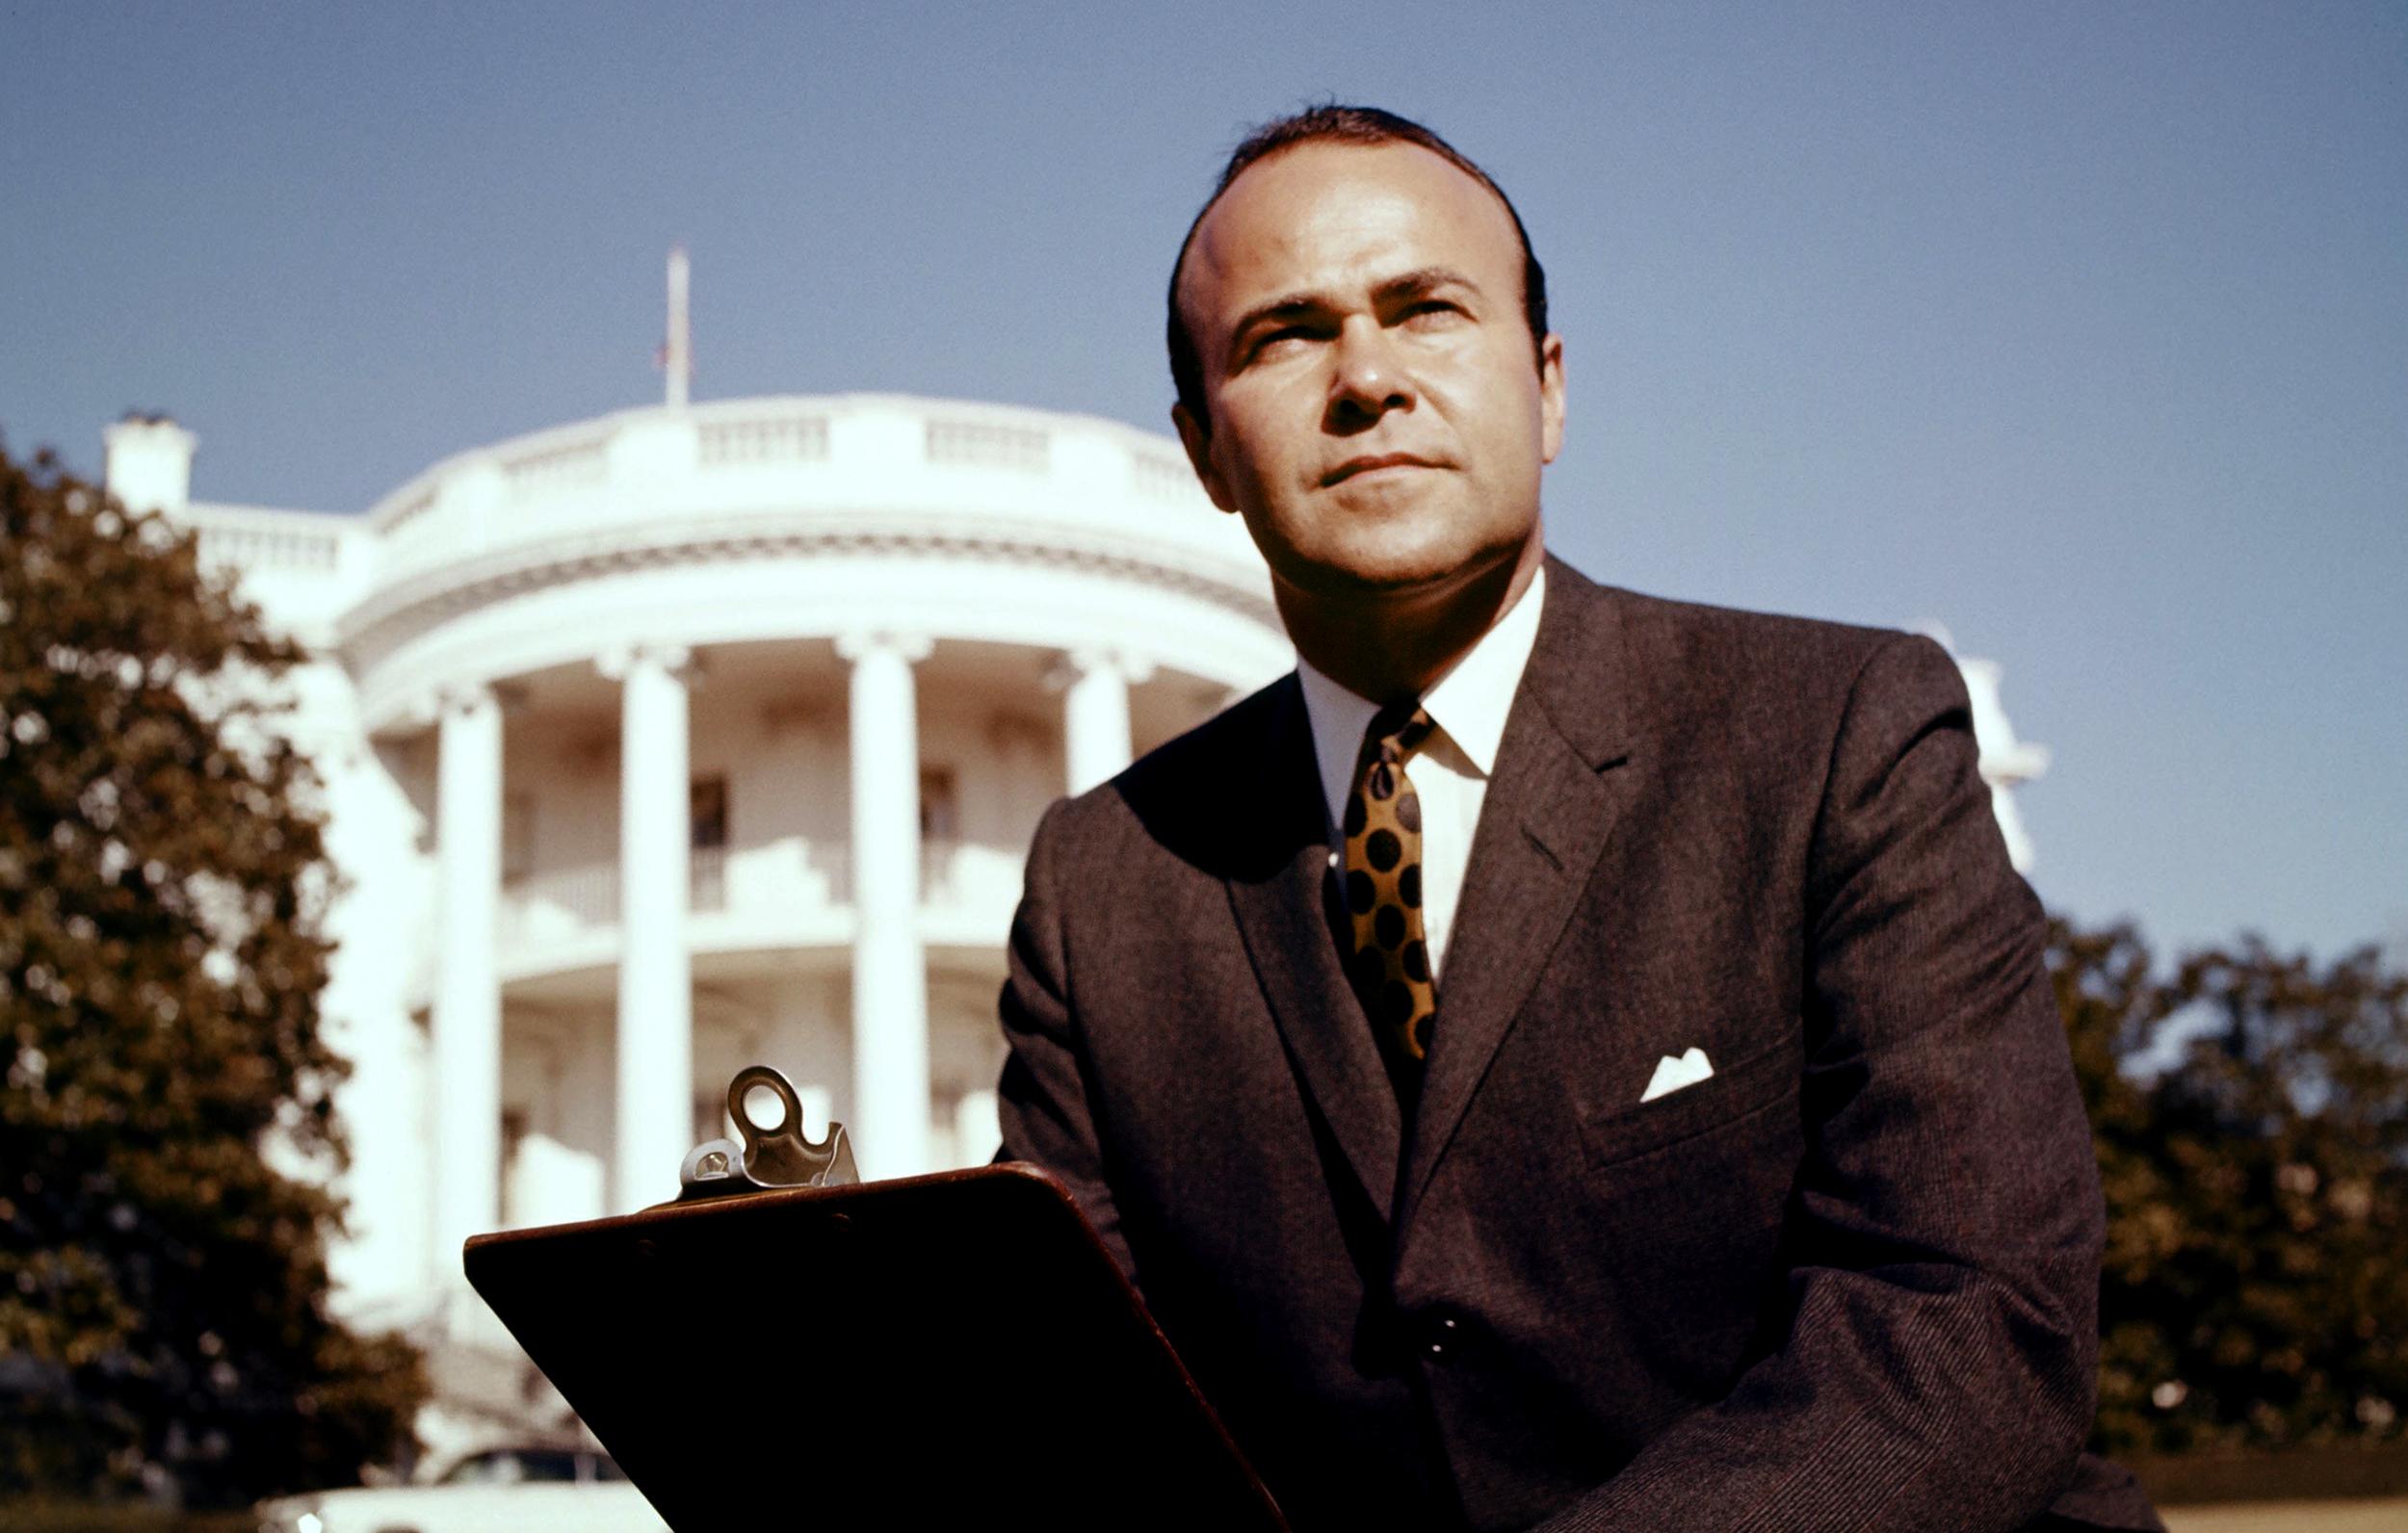 IMG SANDER VANOCUR, TV Newsman Who Covered Kennedy